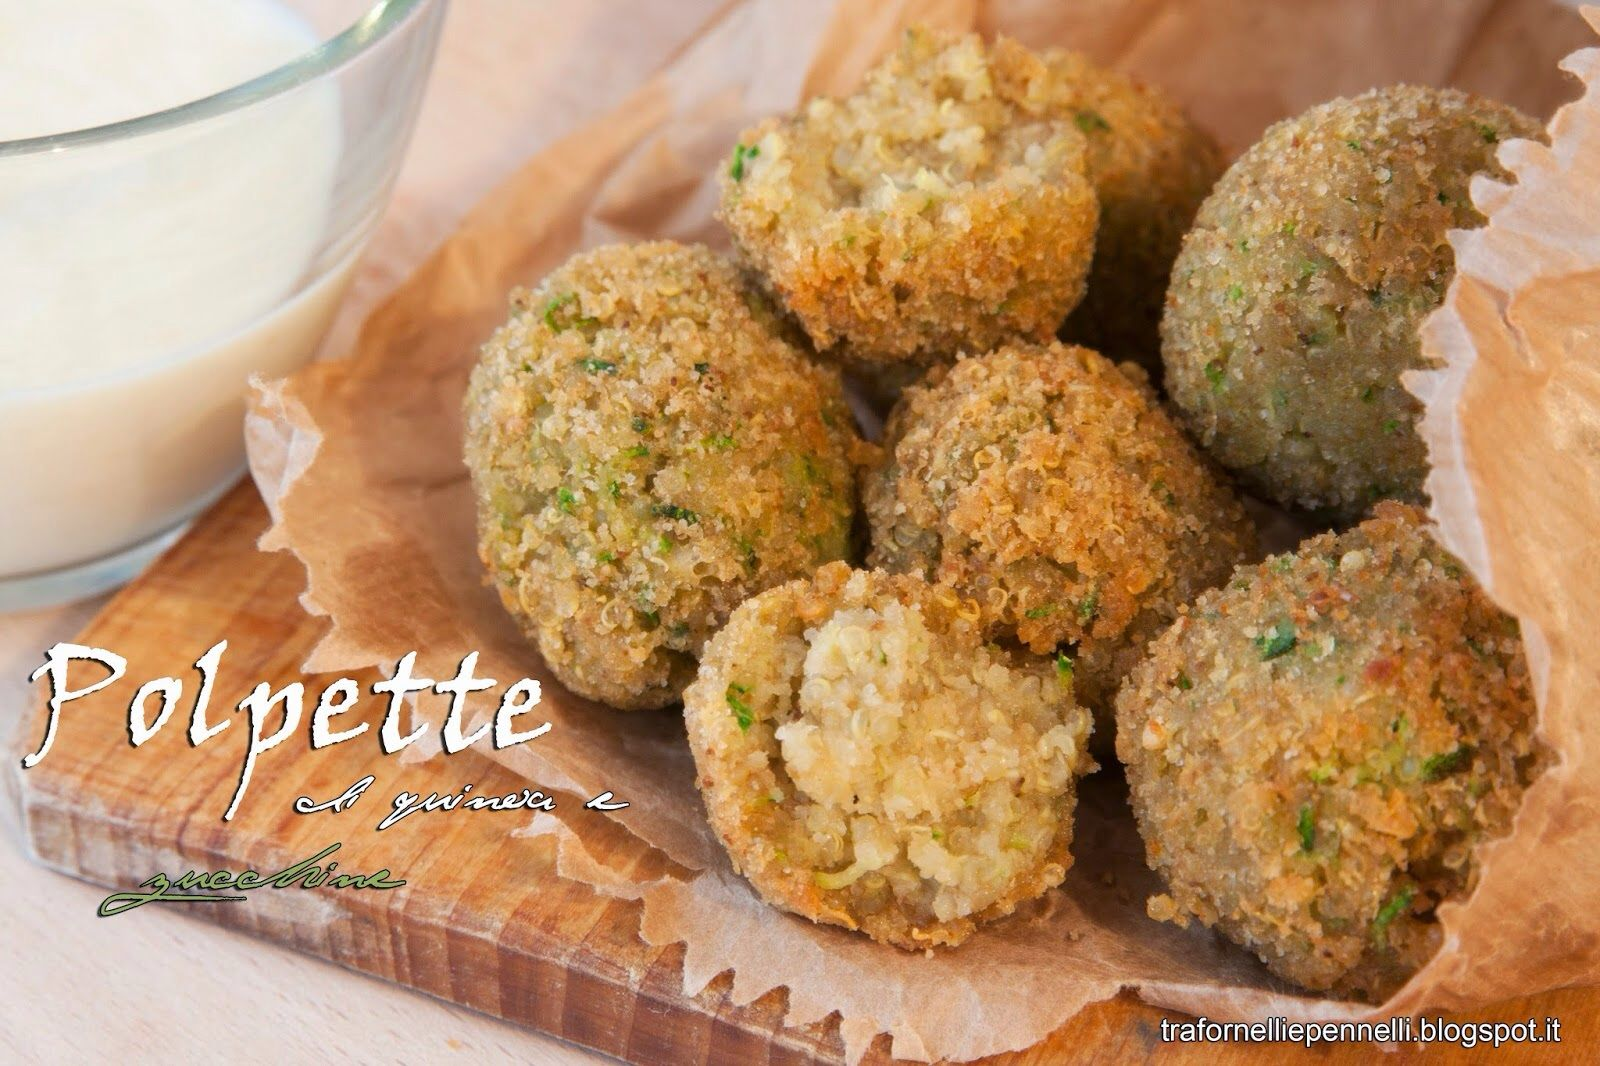 Polpette #quinoa e zucchine on http://trafornelliepennelli.blogspot.it/2014/07/polpette-di-quinoa-e-zucchine.html